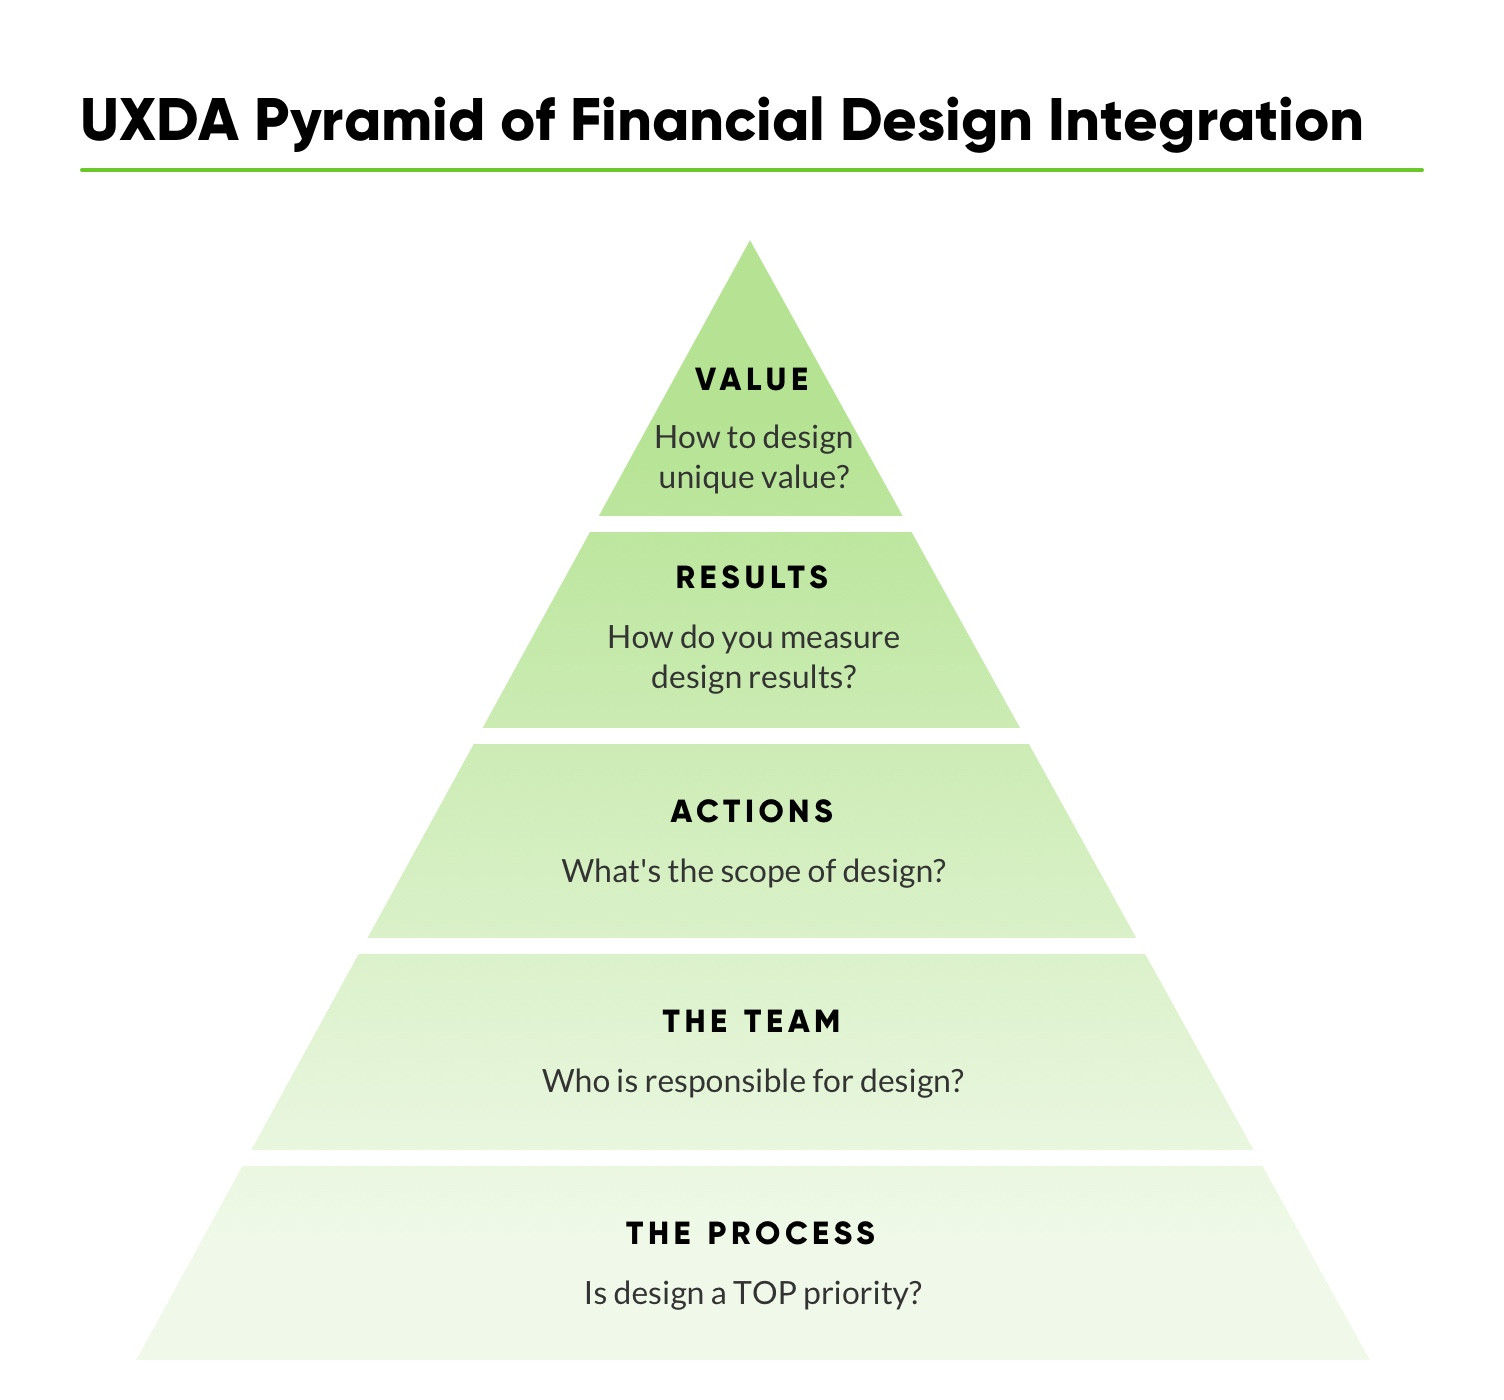 financial-ux-design-methodology-uxda-financial-design-integration-5-S__1504.jpg